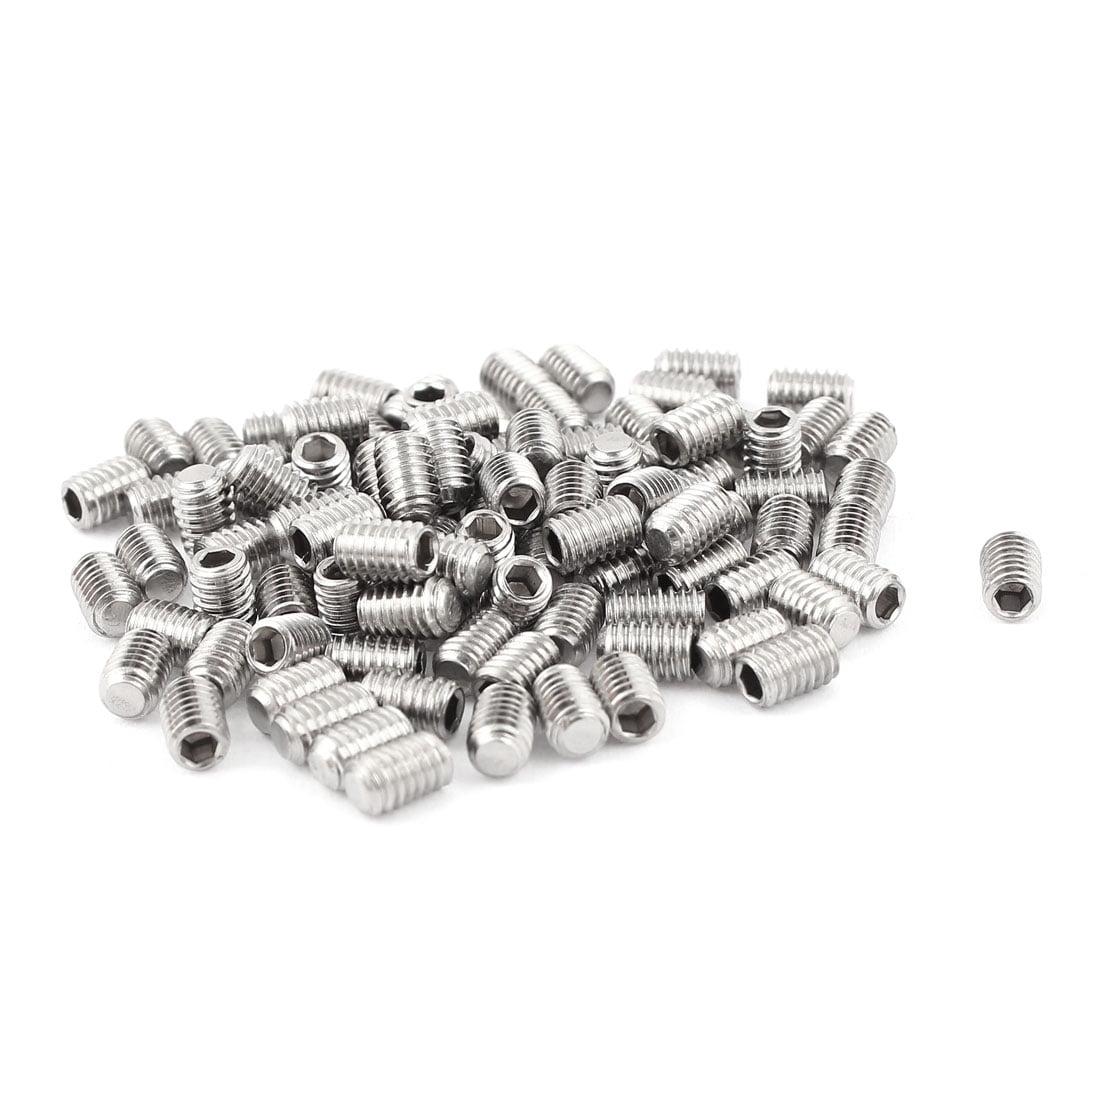 4mm x 6mm Stainless Steel Hexagon Socket Head Set Cup Point Grub Screws 100pcs